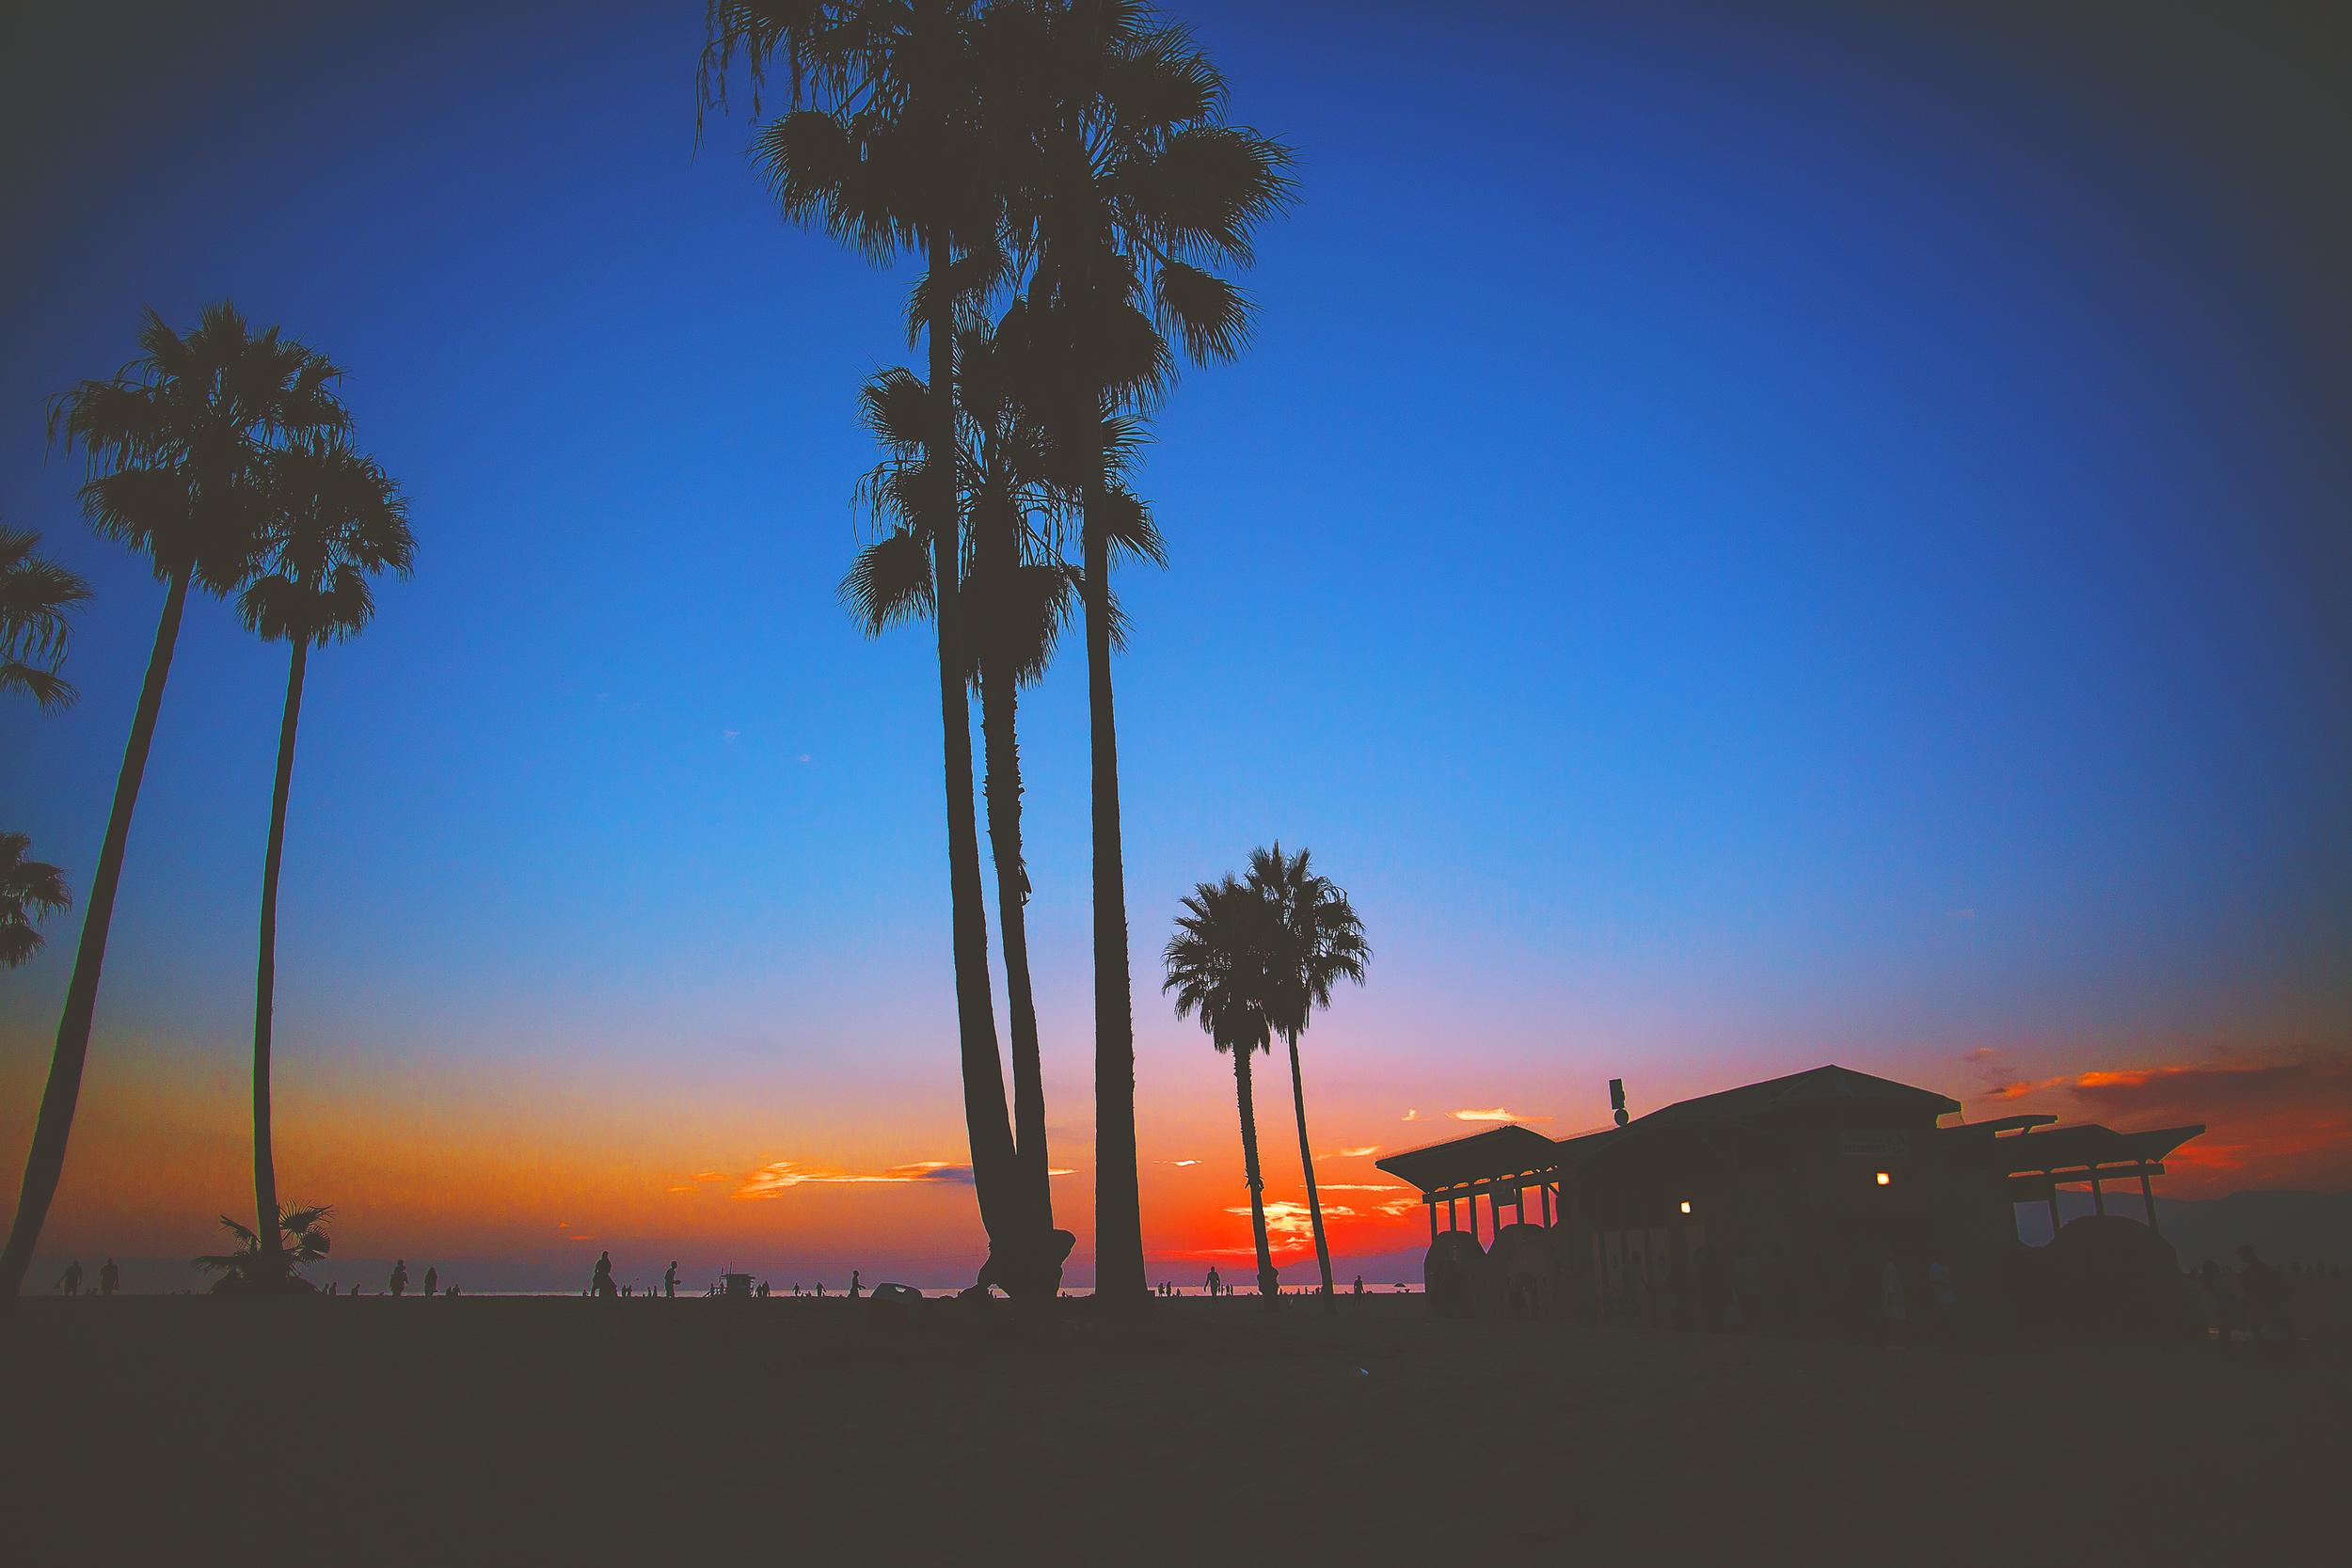 JLRoyal_Venice_PalmtreeSunsetsSFW.jpg